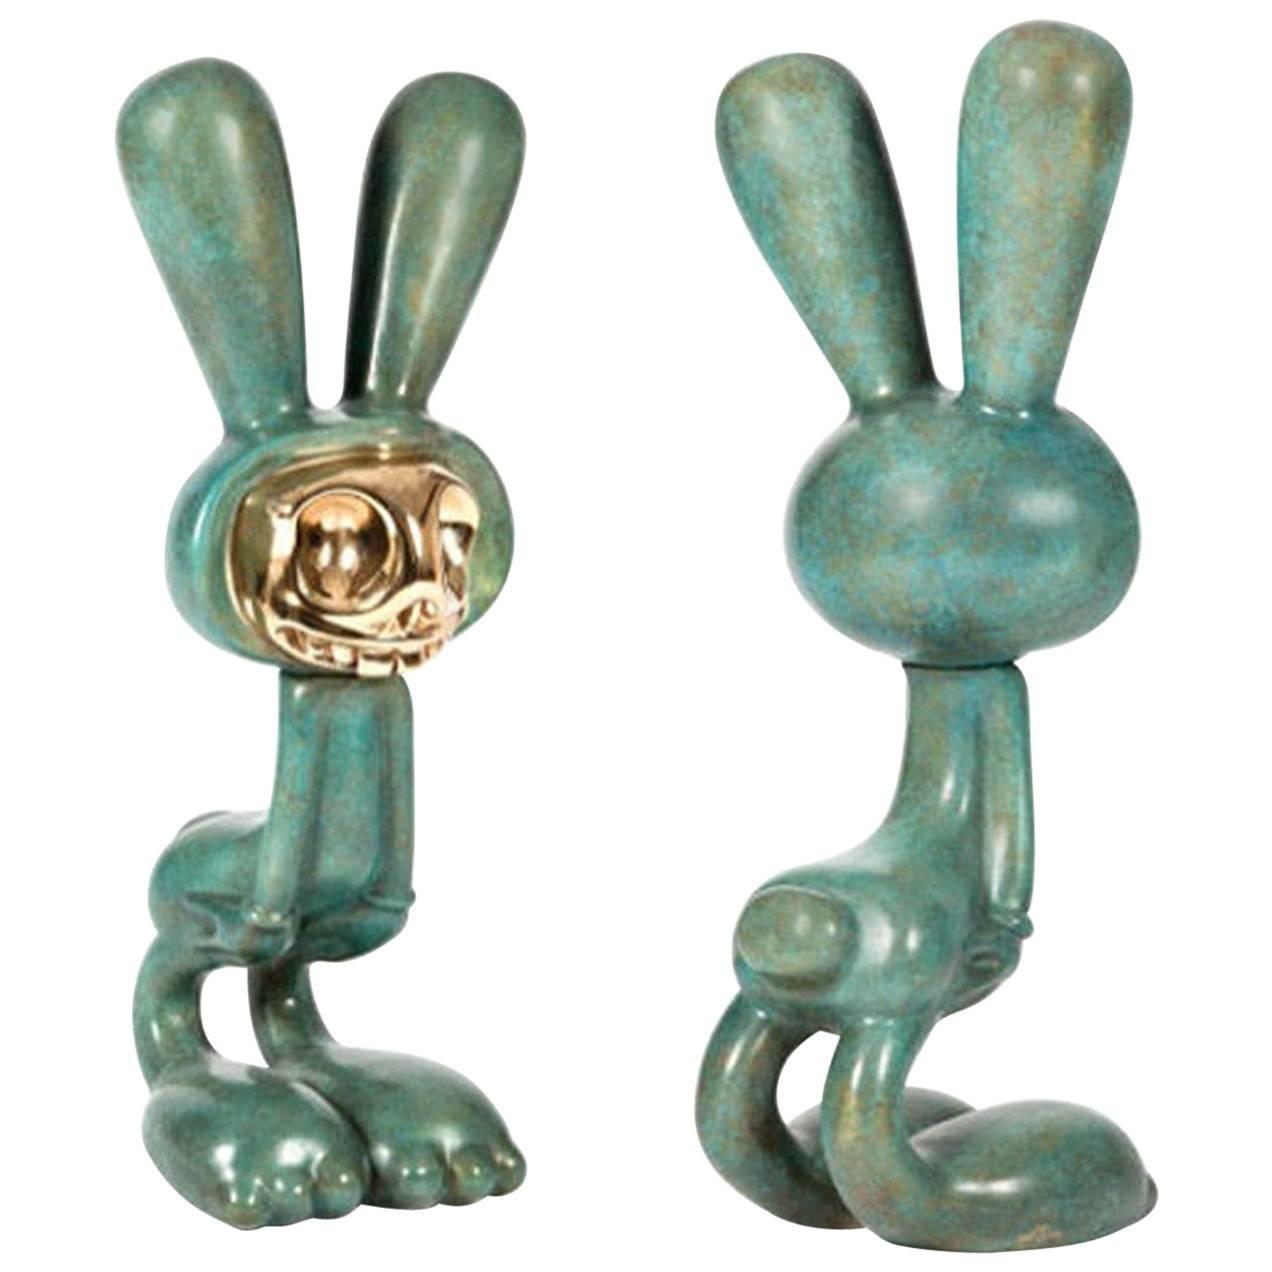 Coniglieschio Bronze Sculpture by Massimo Giacon for Superego Editions, Italy